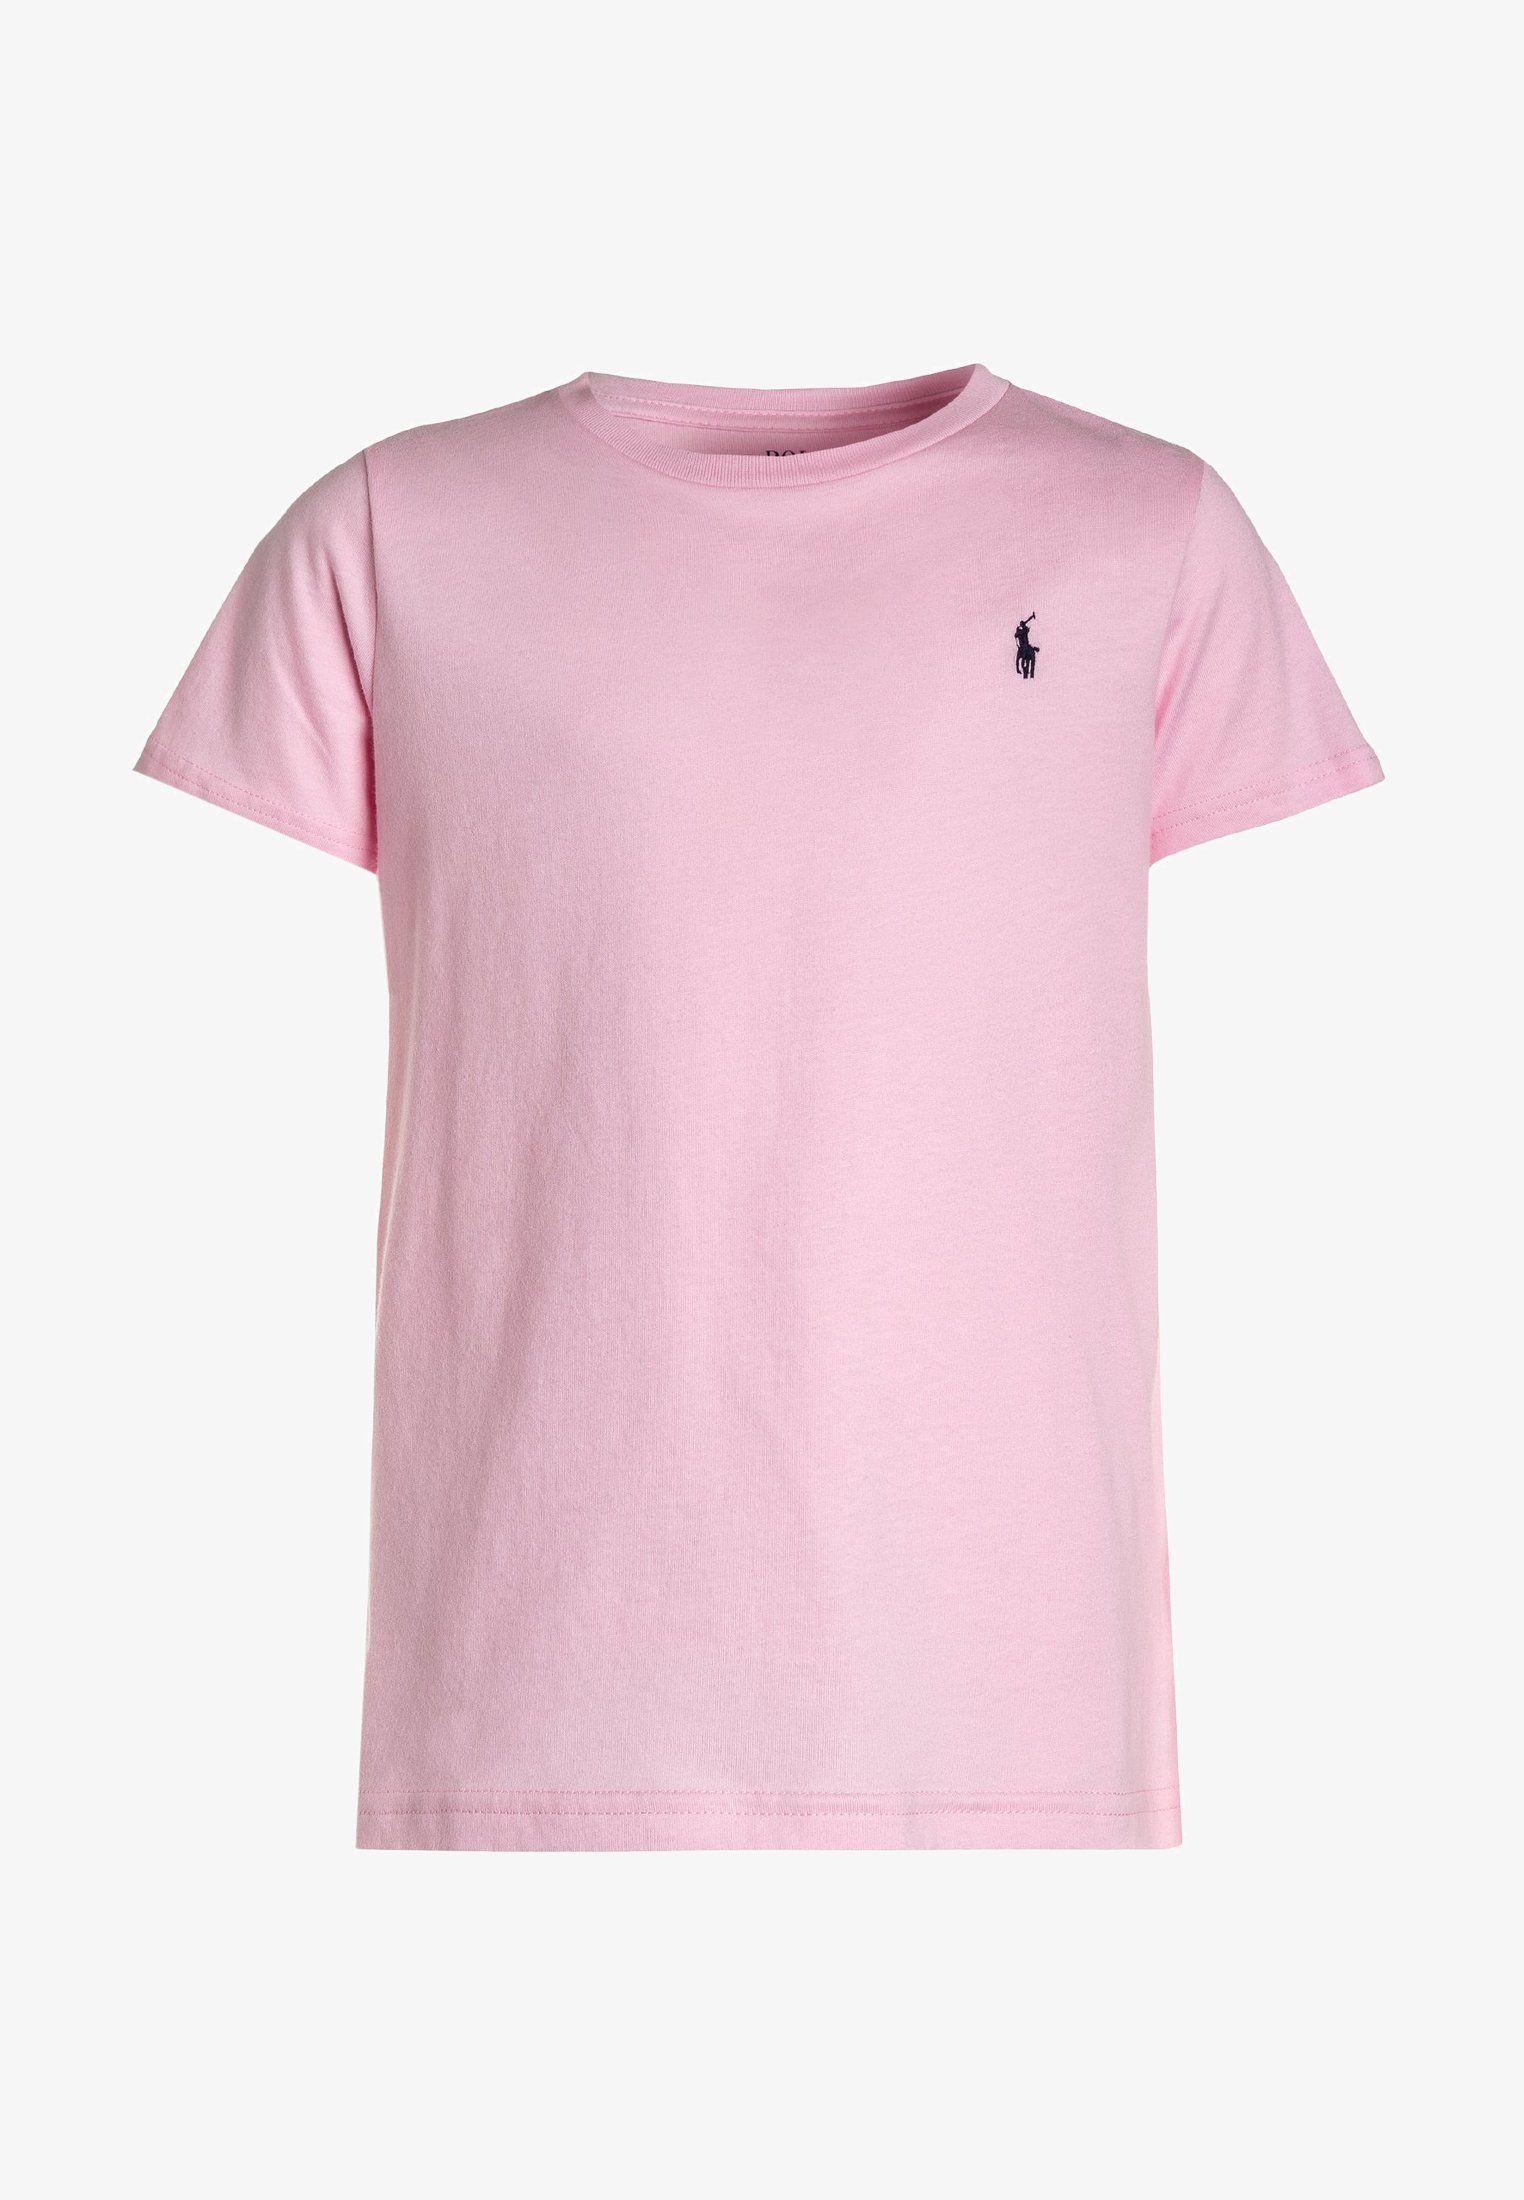 25af84fad115 Polo Ralph Lauren T-shirt basique - carmel pink - ZALANDO.BE ...